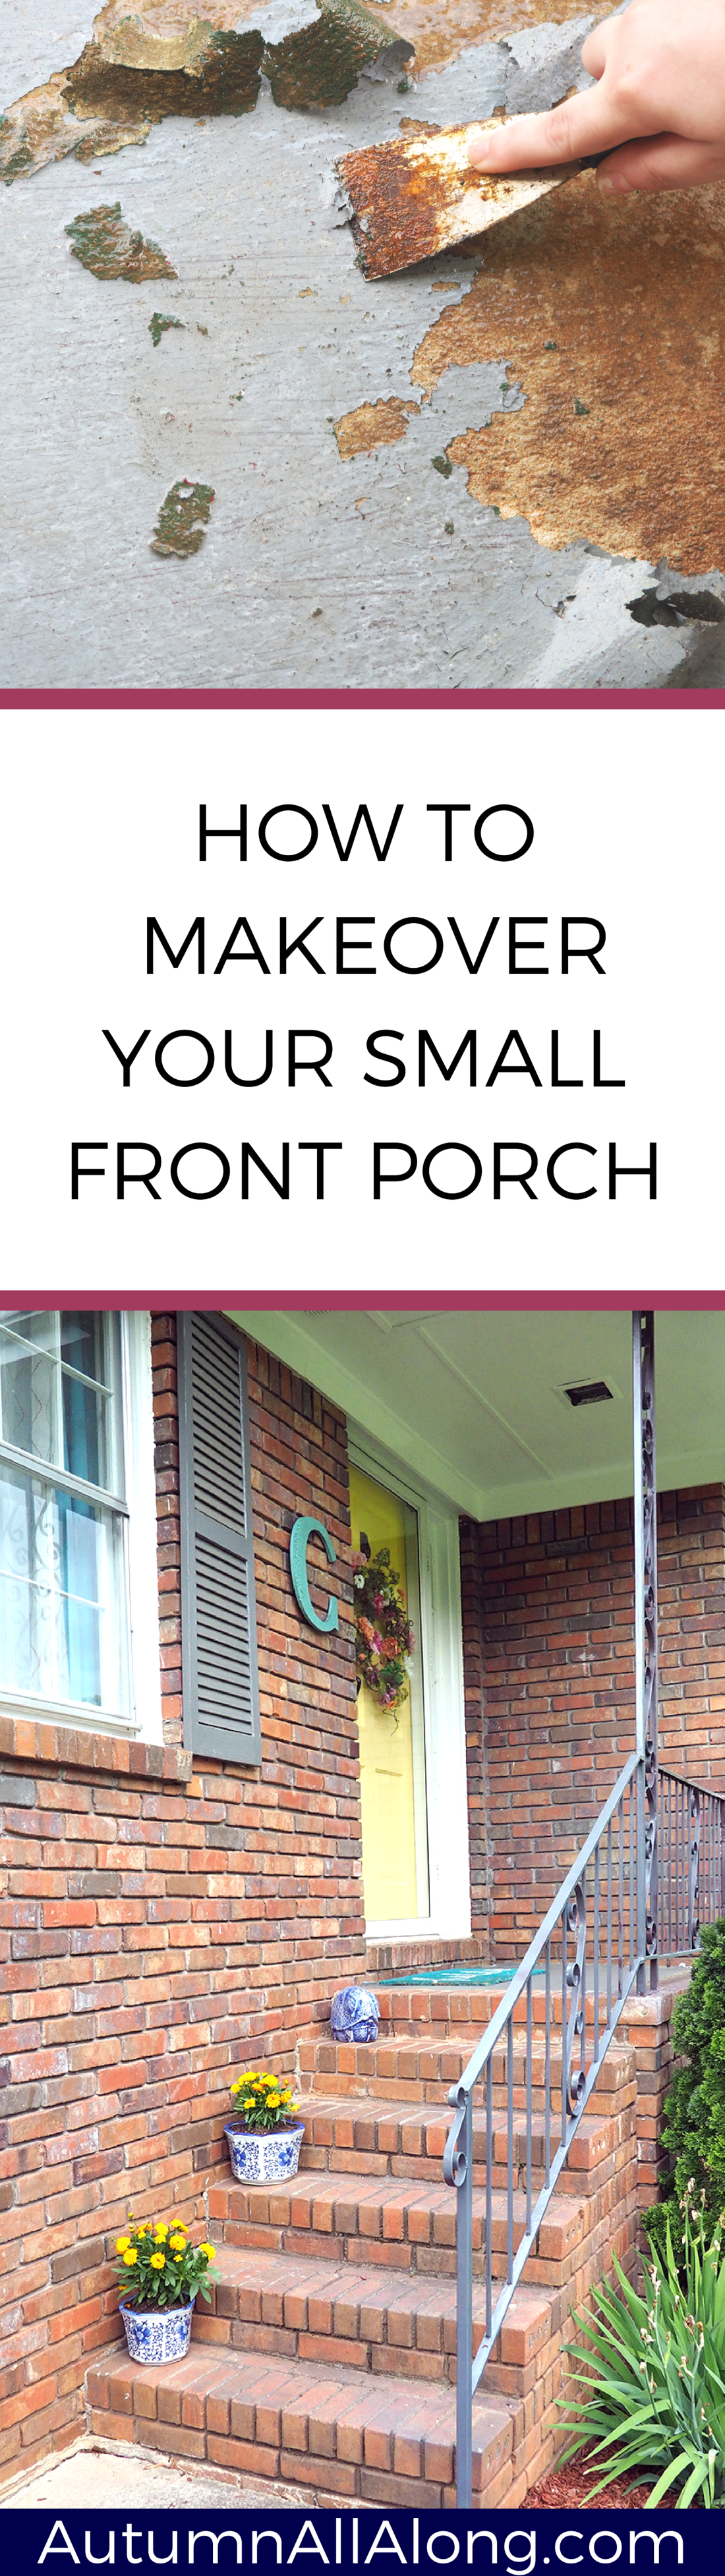 10 Best Diy Home Repair Images On Pinterest Manual Guide